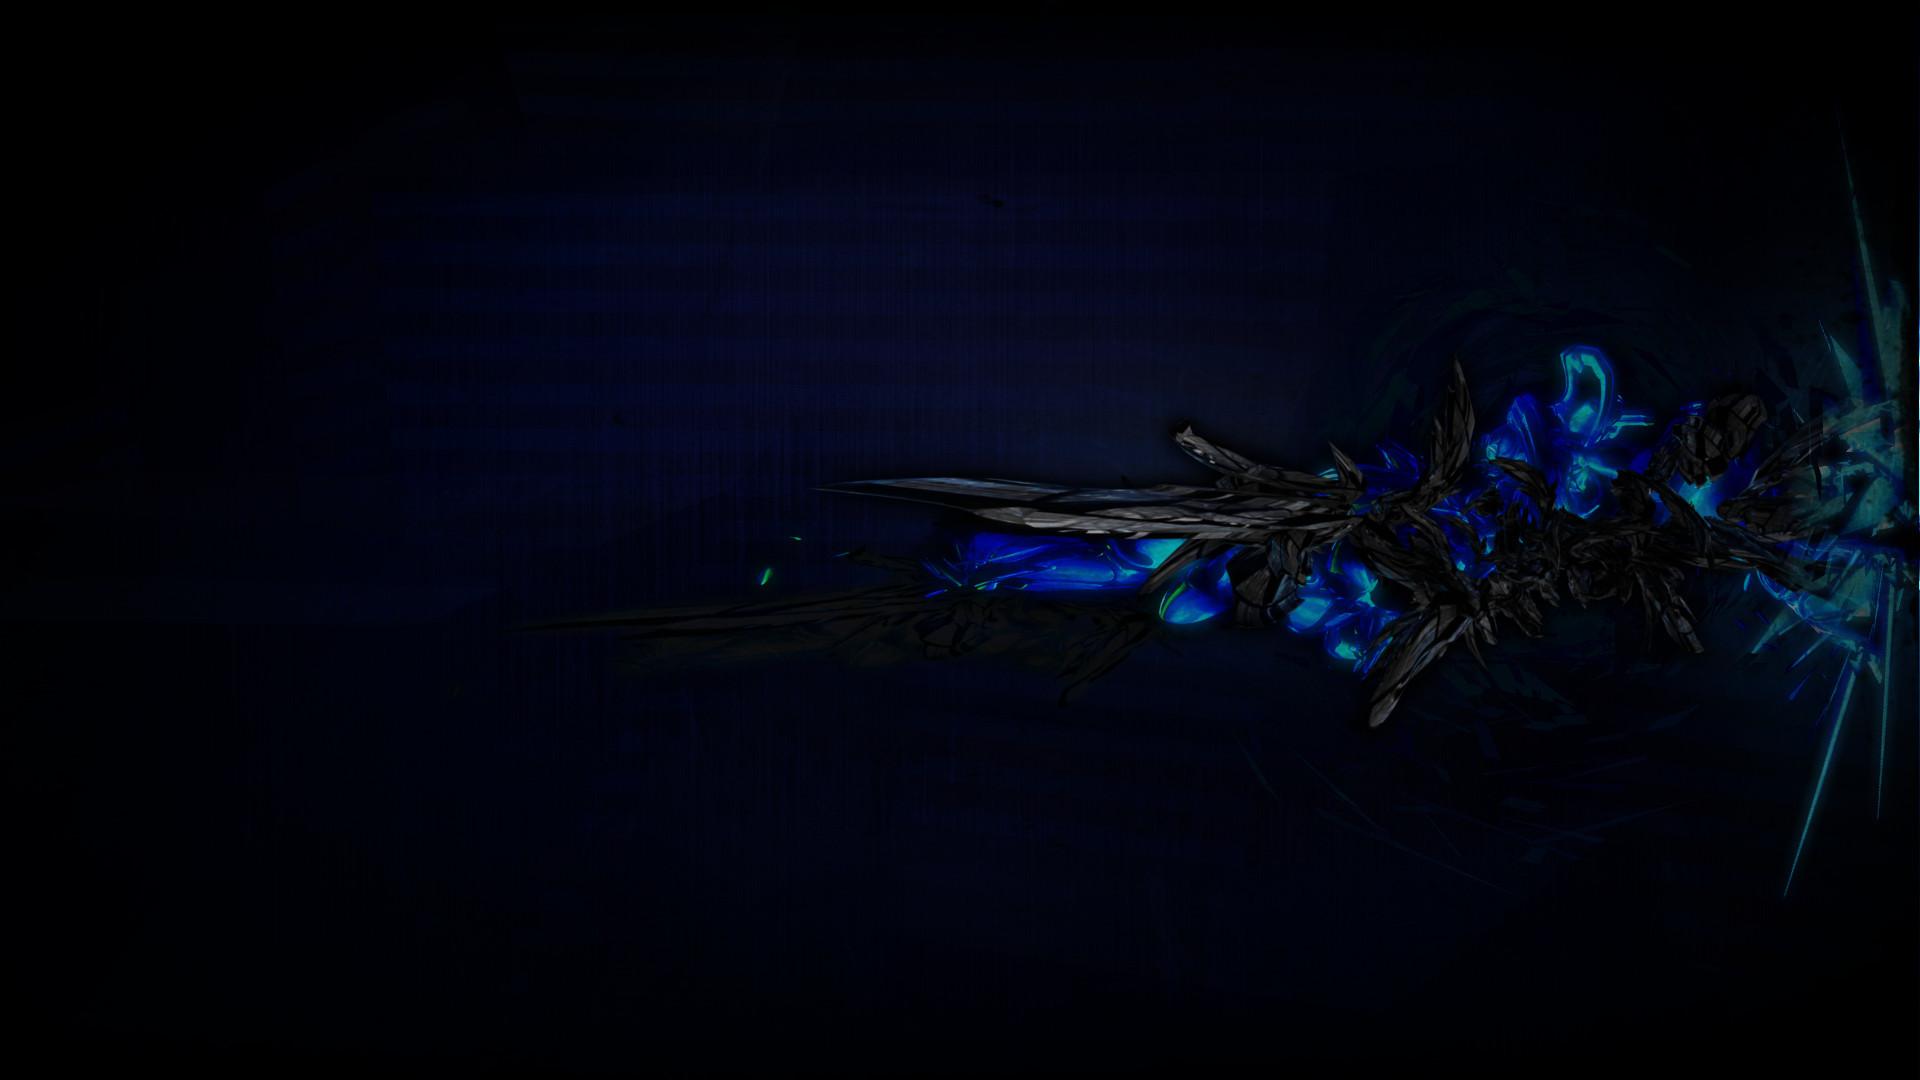 Dark Owl Wallpapers | HD Wallpapers | Pinterest | Dark blue wallpaper,  Wallpaper and Dark wallpaper